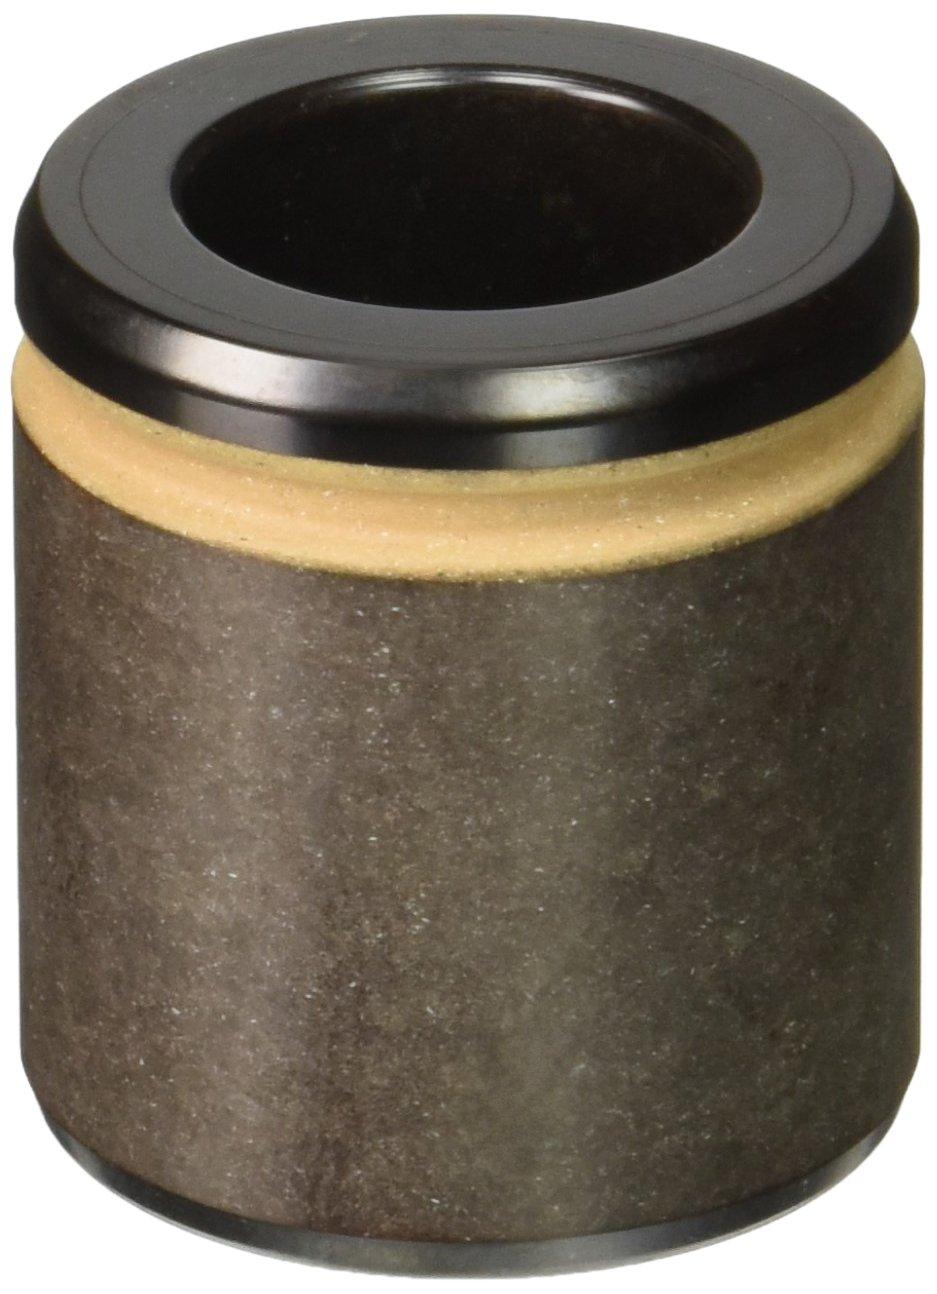 Carlson Quality Brake Parts 7842 Caliper Piston